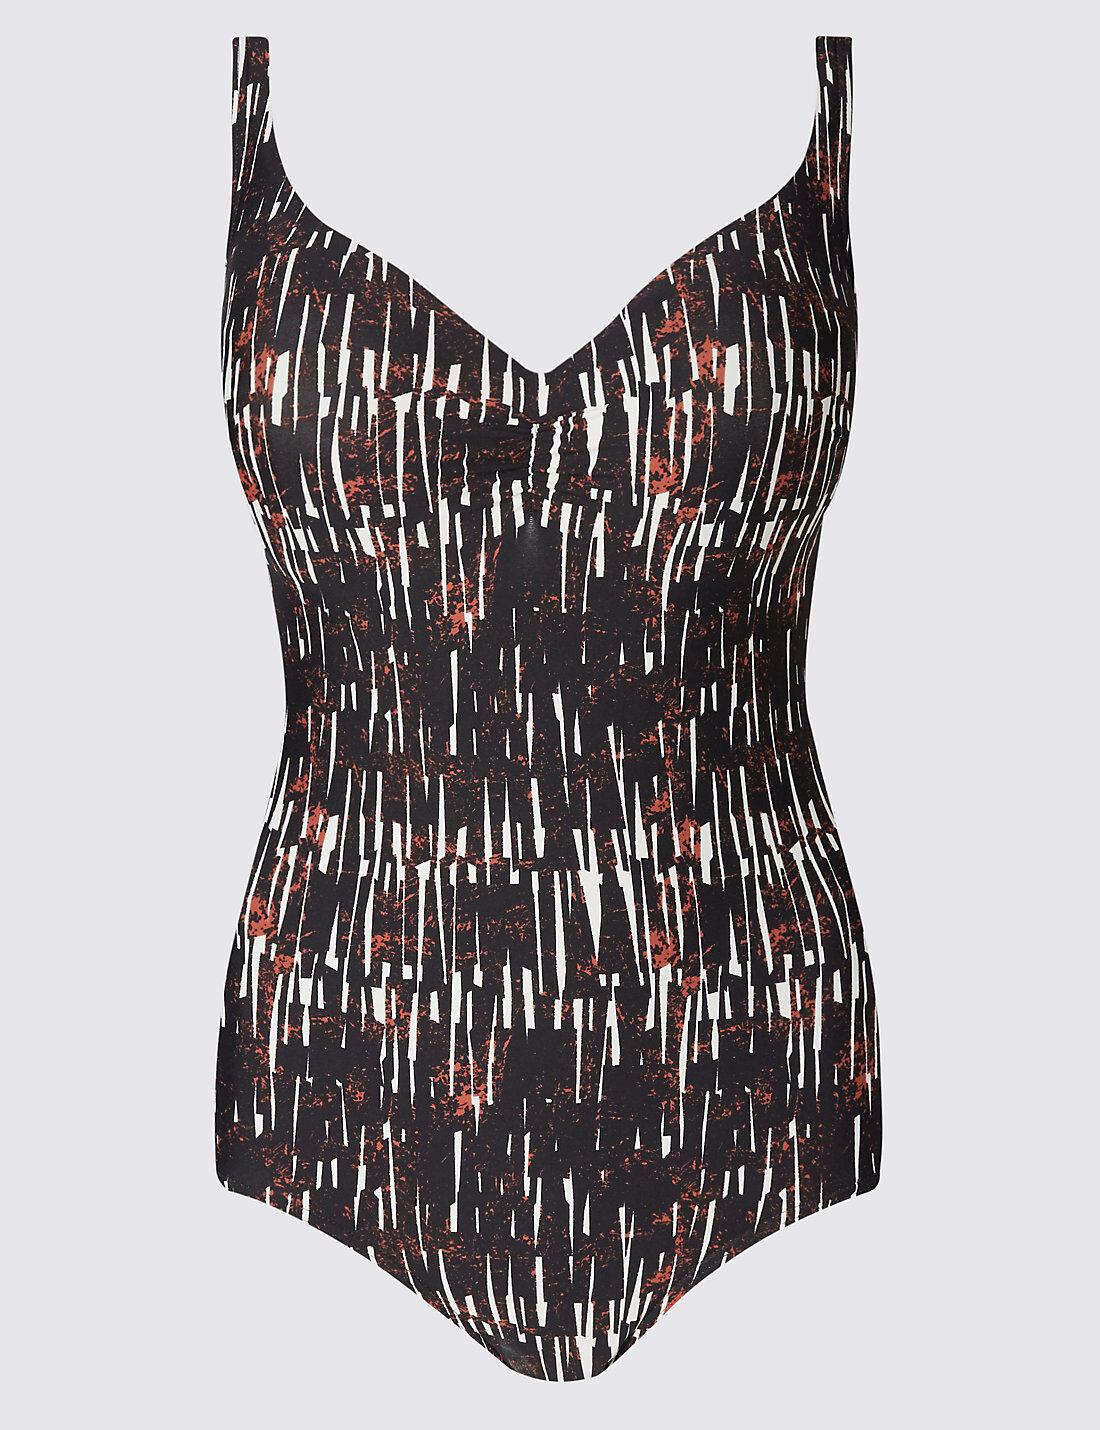 M&s Black Print Plunge Swimsuit Swimming Costume Secret Slimming 34dd 34 DD